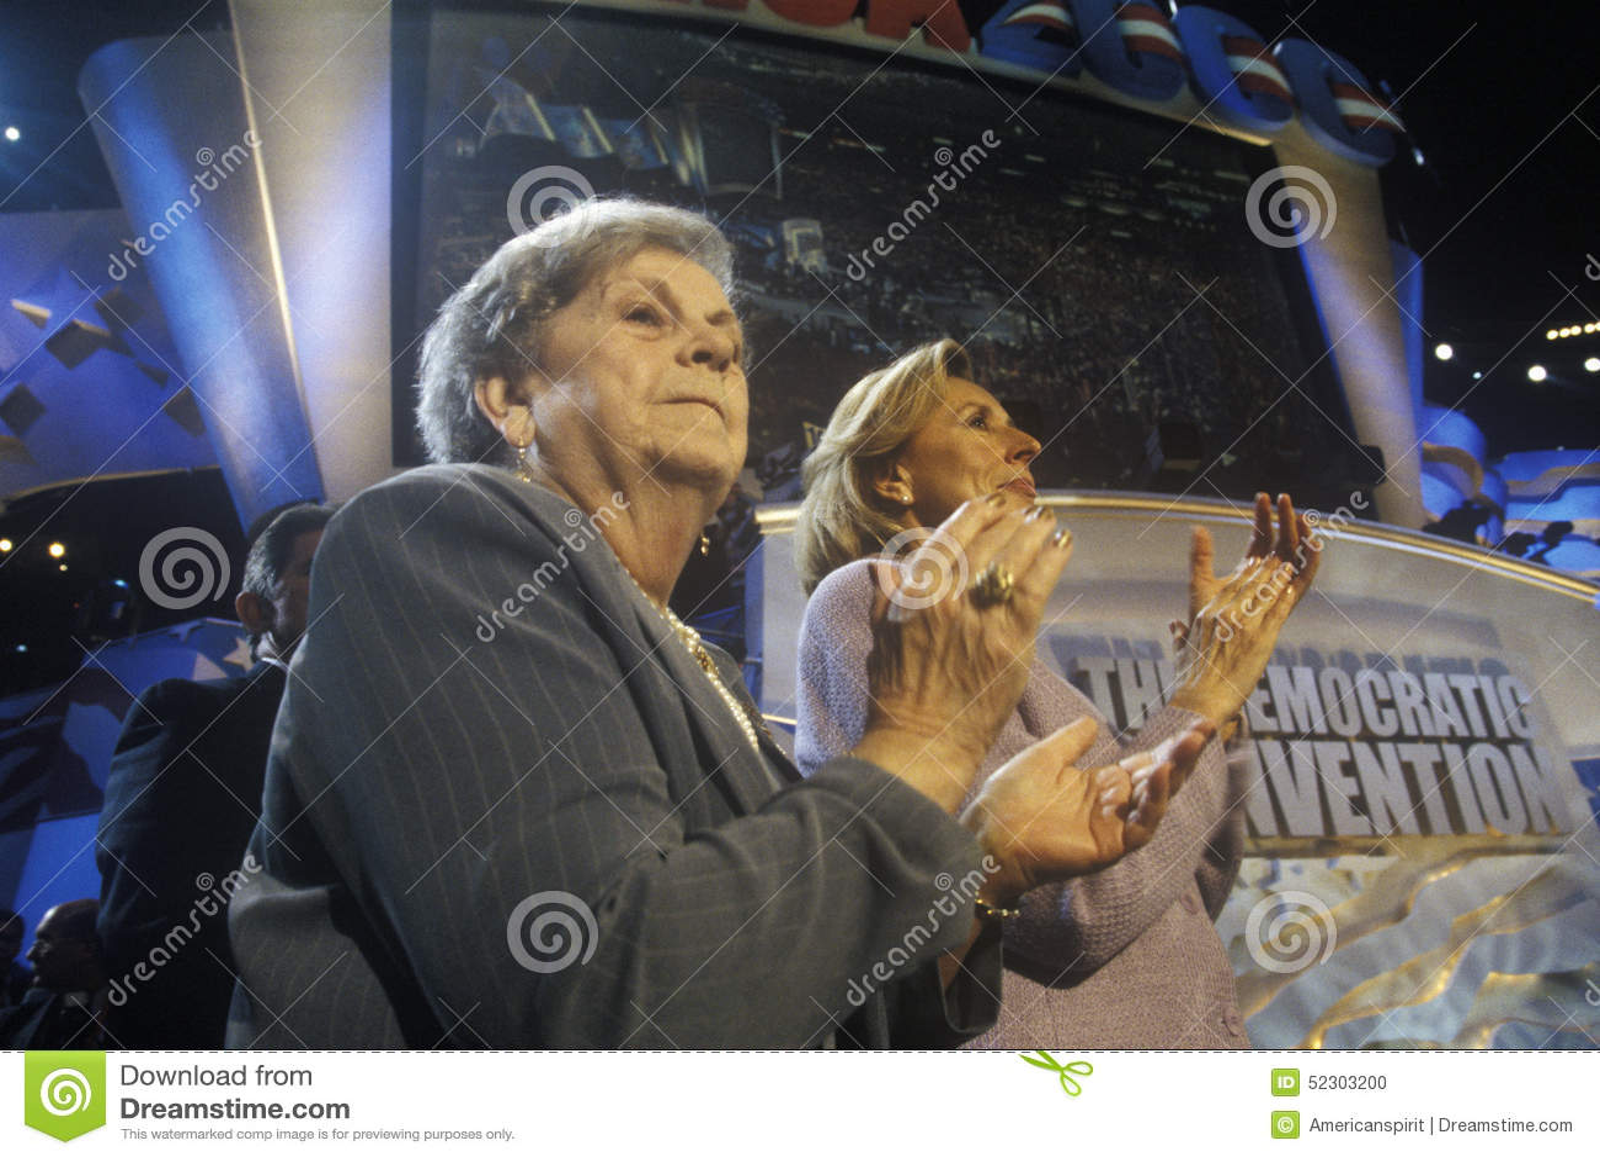 Hadassah Lieberman και κα Lieberman στη δημοκρατική Συνθήκη του 2000 στο Staples Center, Λος Άντζελες, ασβέστιο